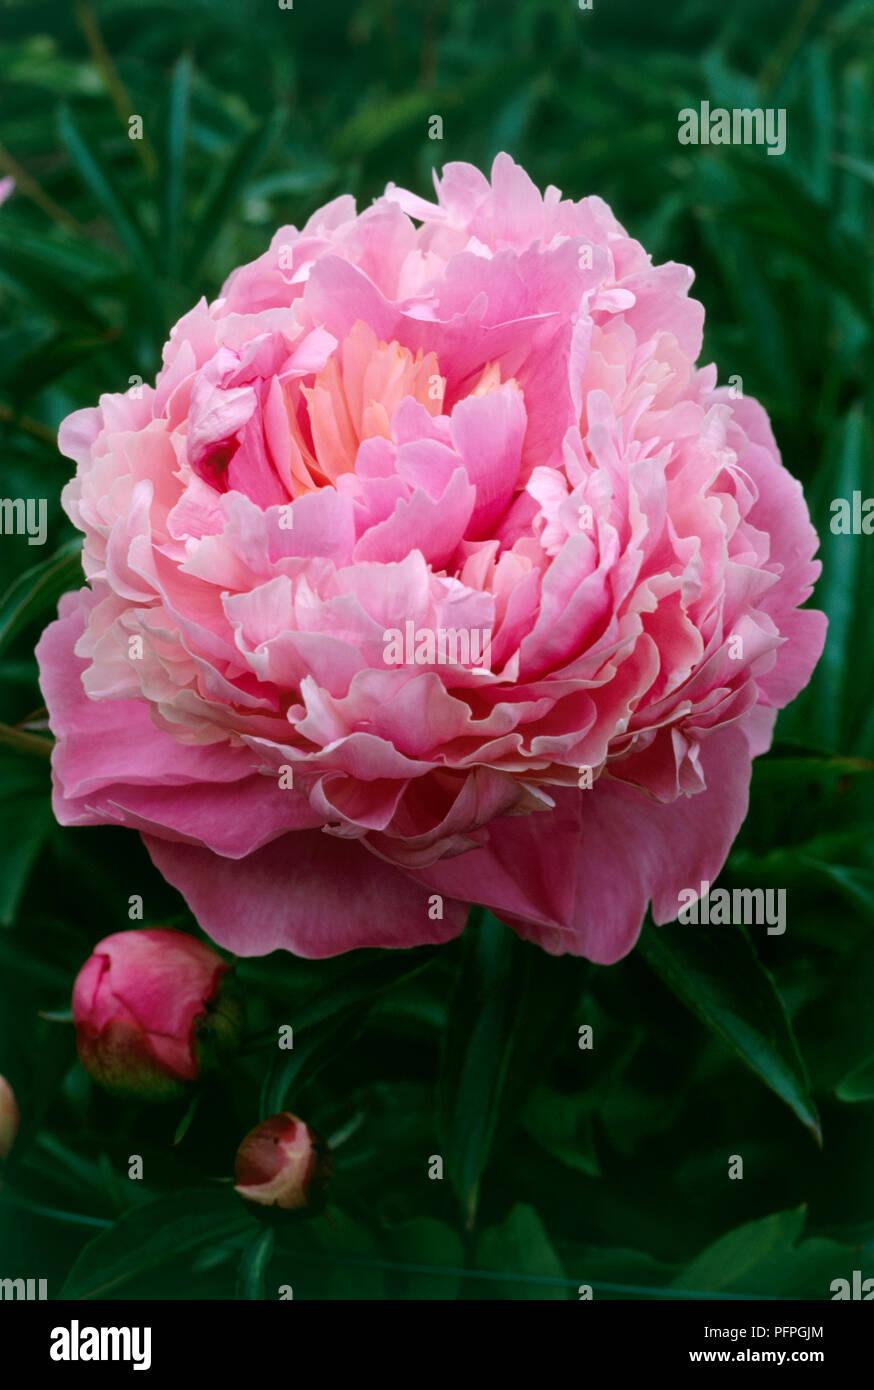 Paeonia Lactiflora Madame Ducel Chinese Peony Pink Flower Head